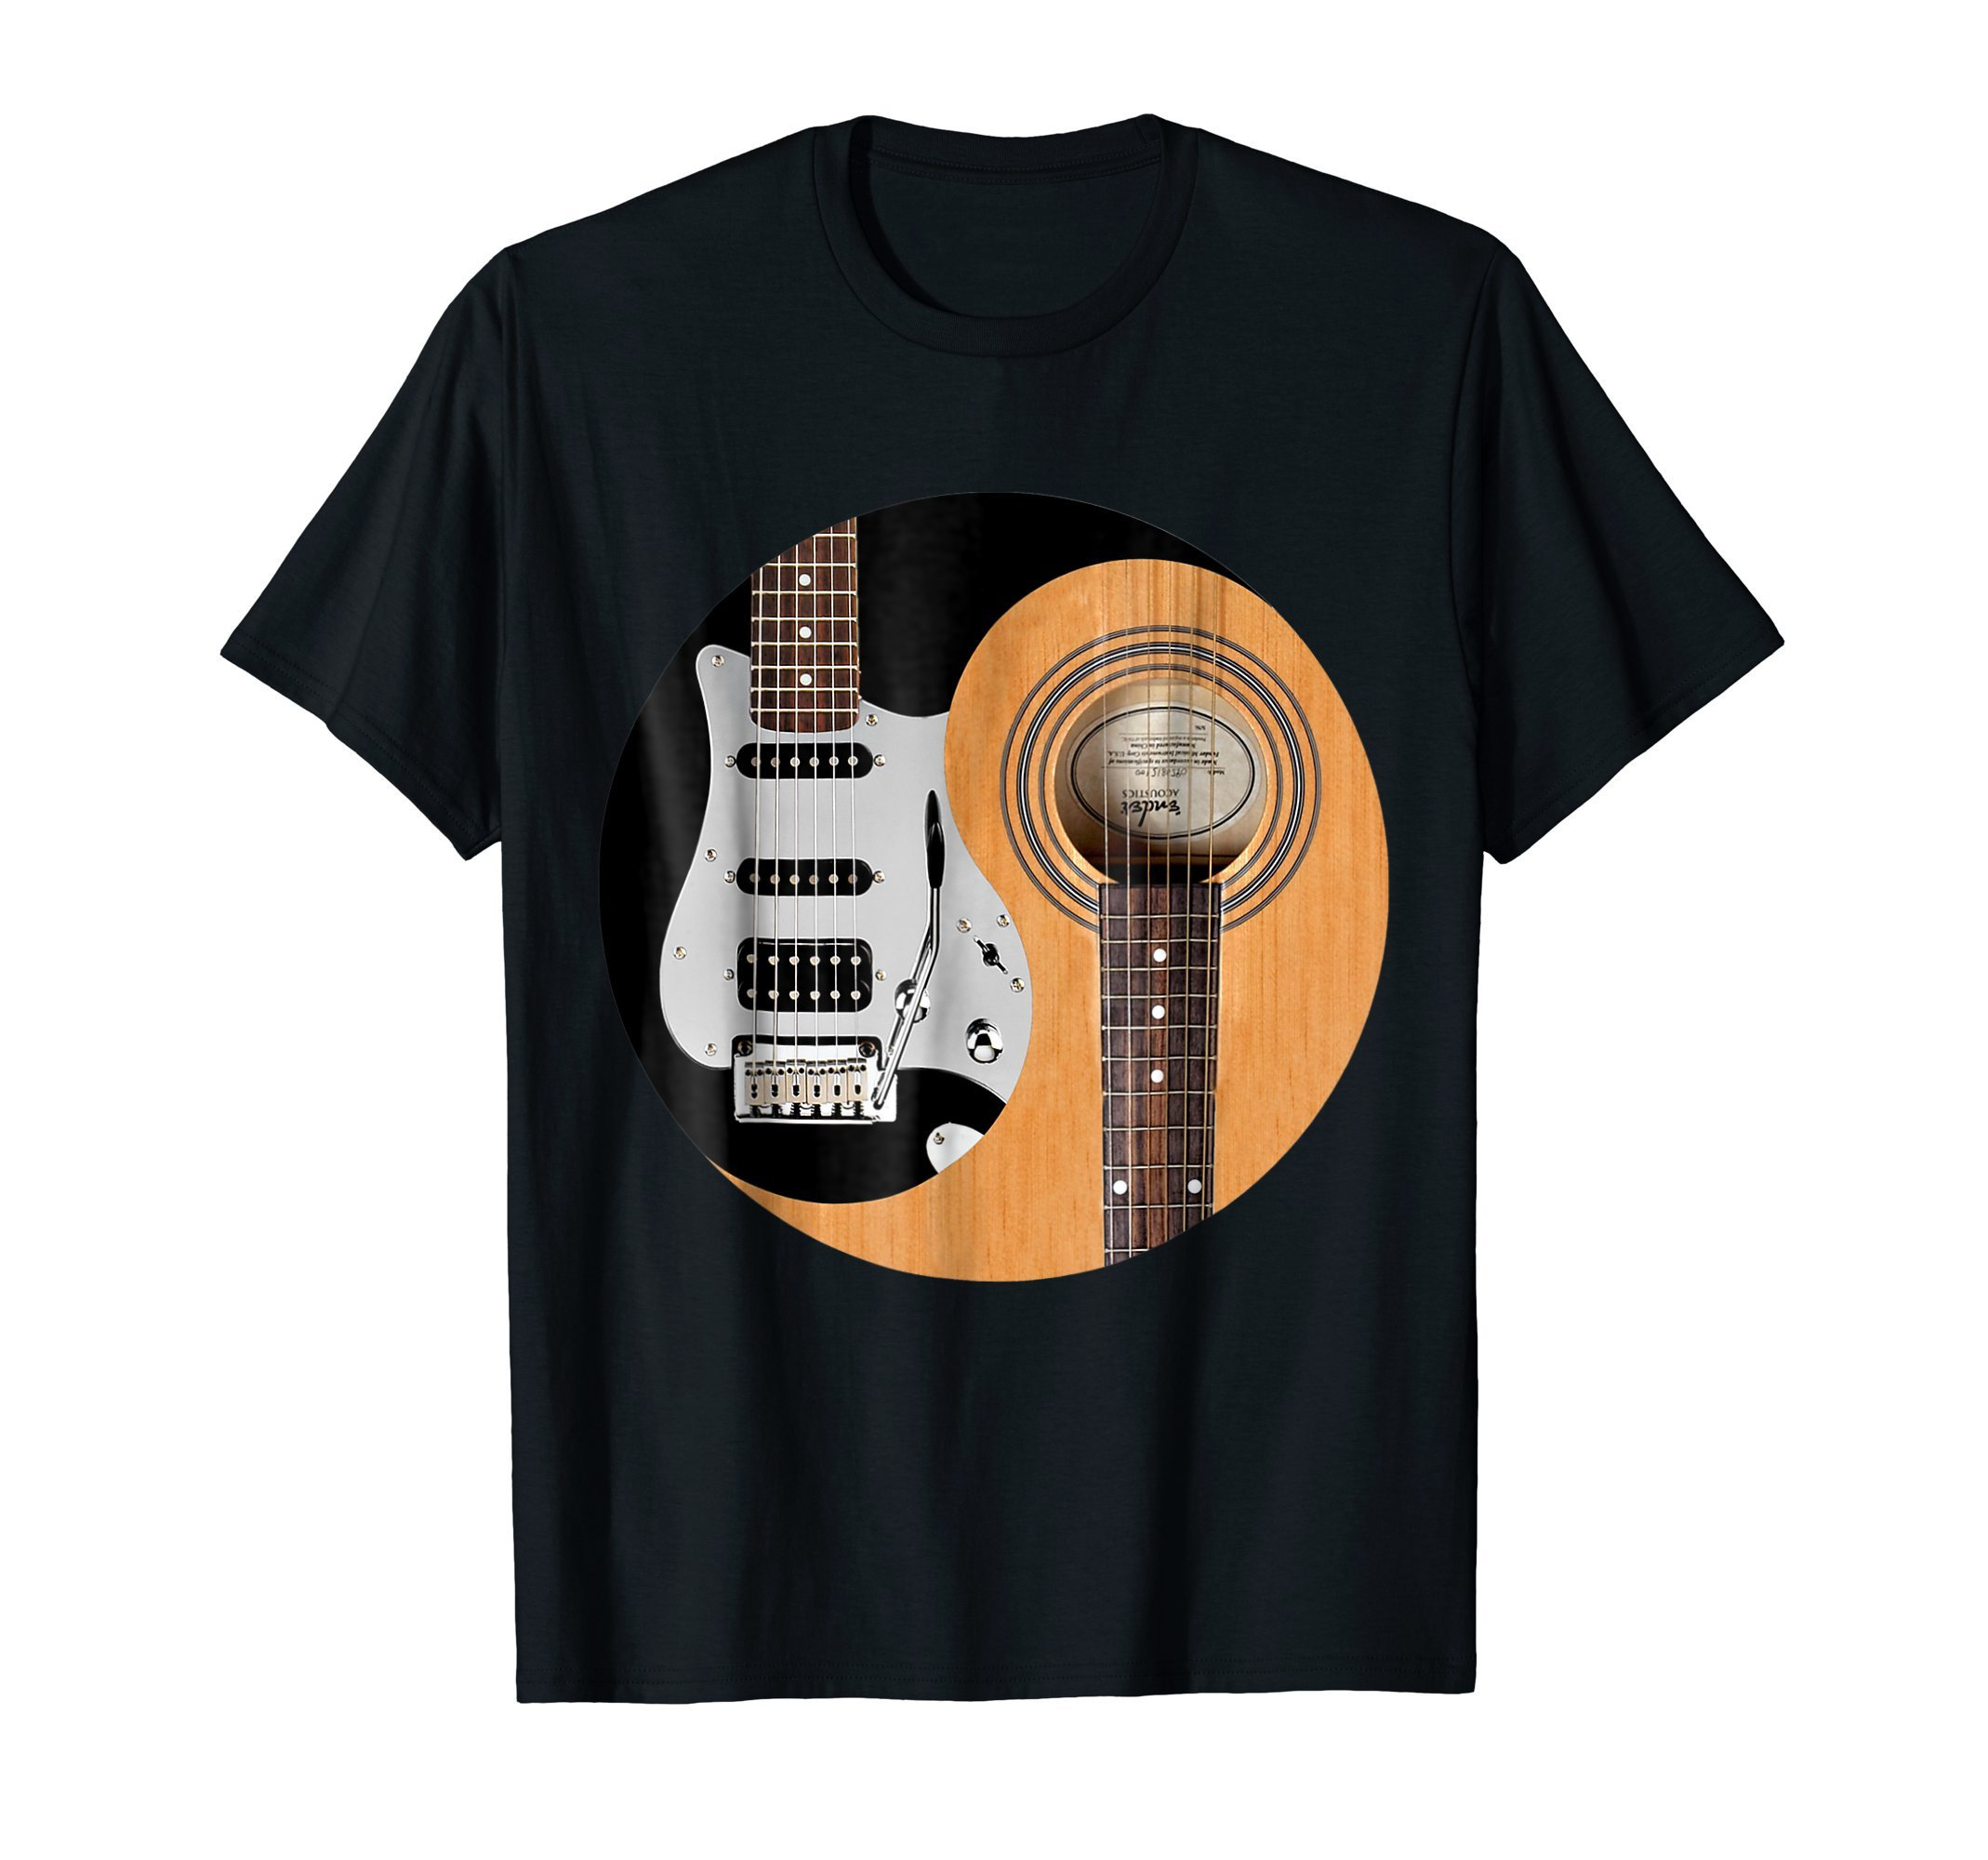 Guitar Yin Yang Acoustic And Electric Guitars T-Shirt by Guitar Power Co.